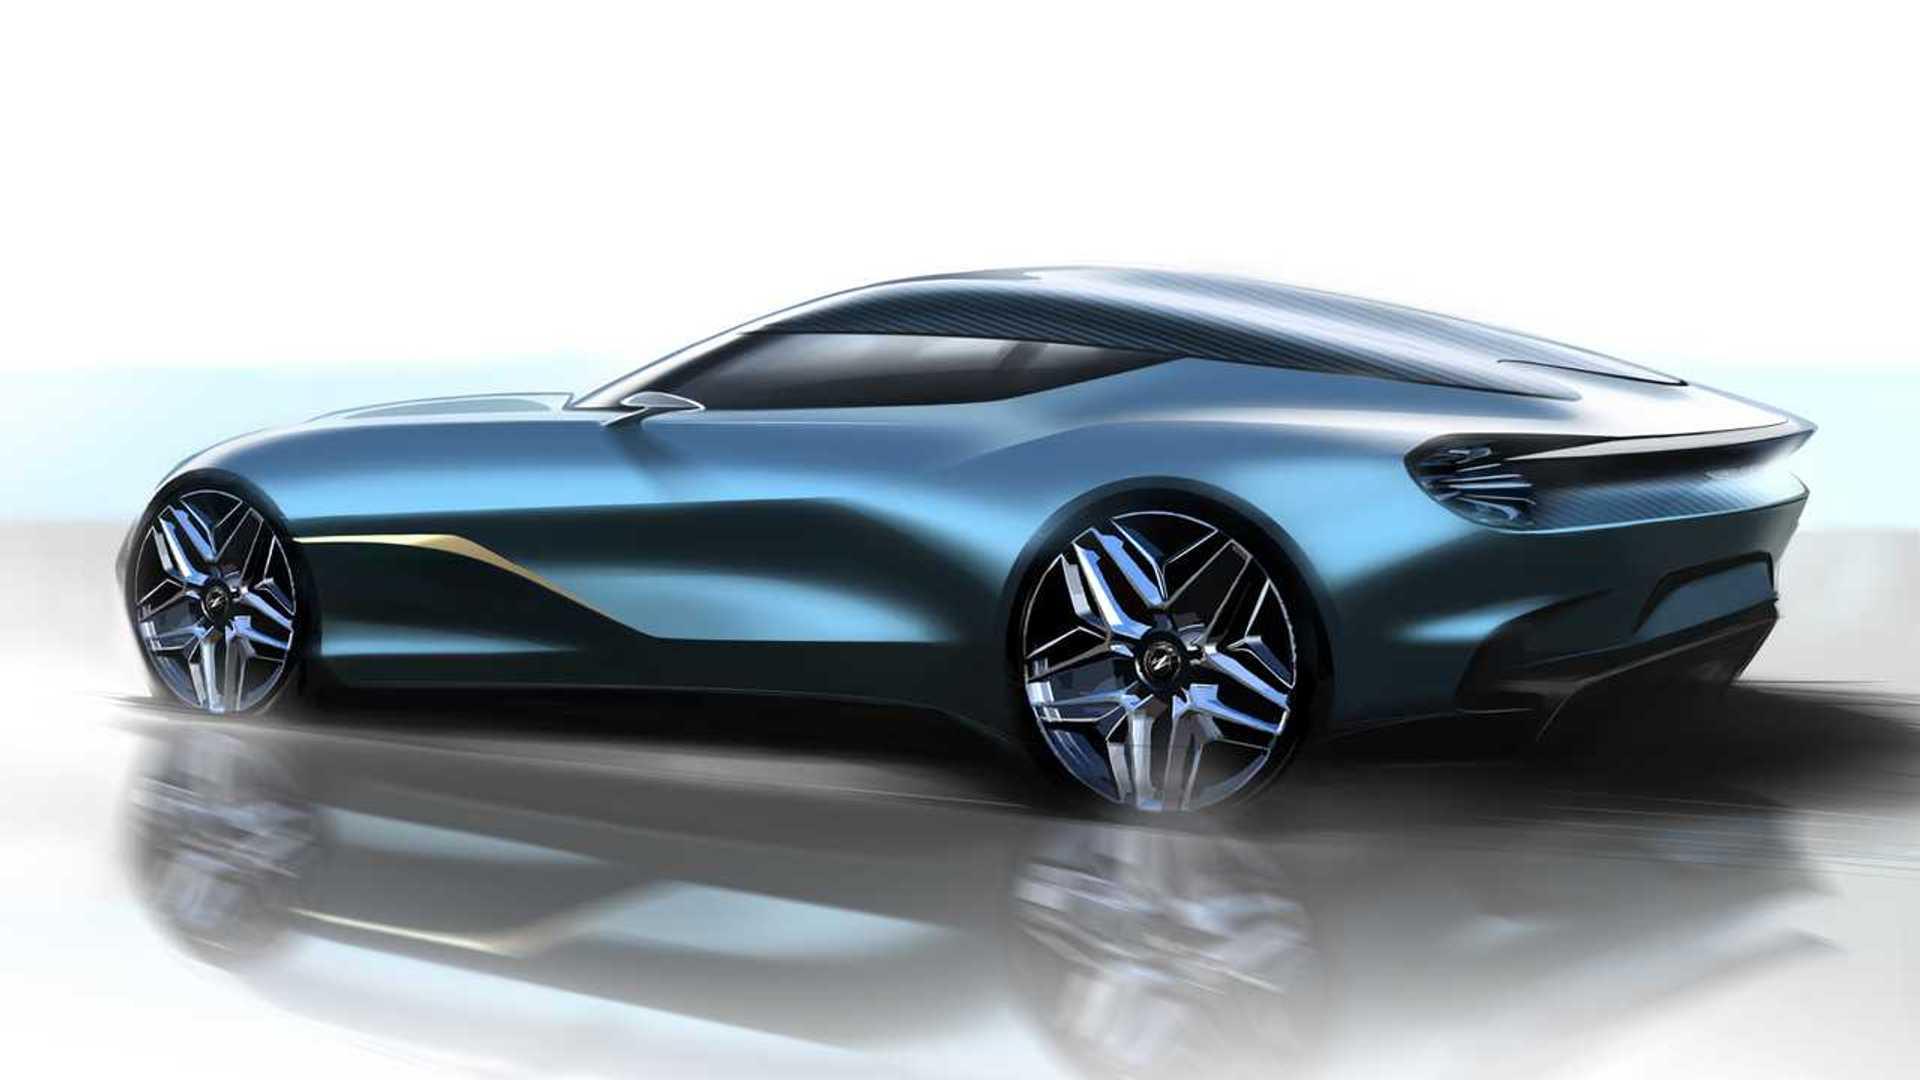 2019 - [Aston Martin] DBS Superleggera - Page 2 Aston-martin-dbs-gt-zagato